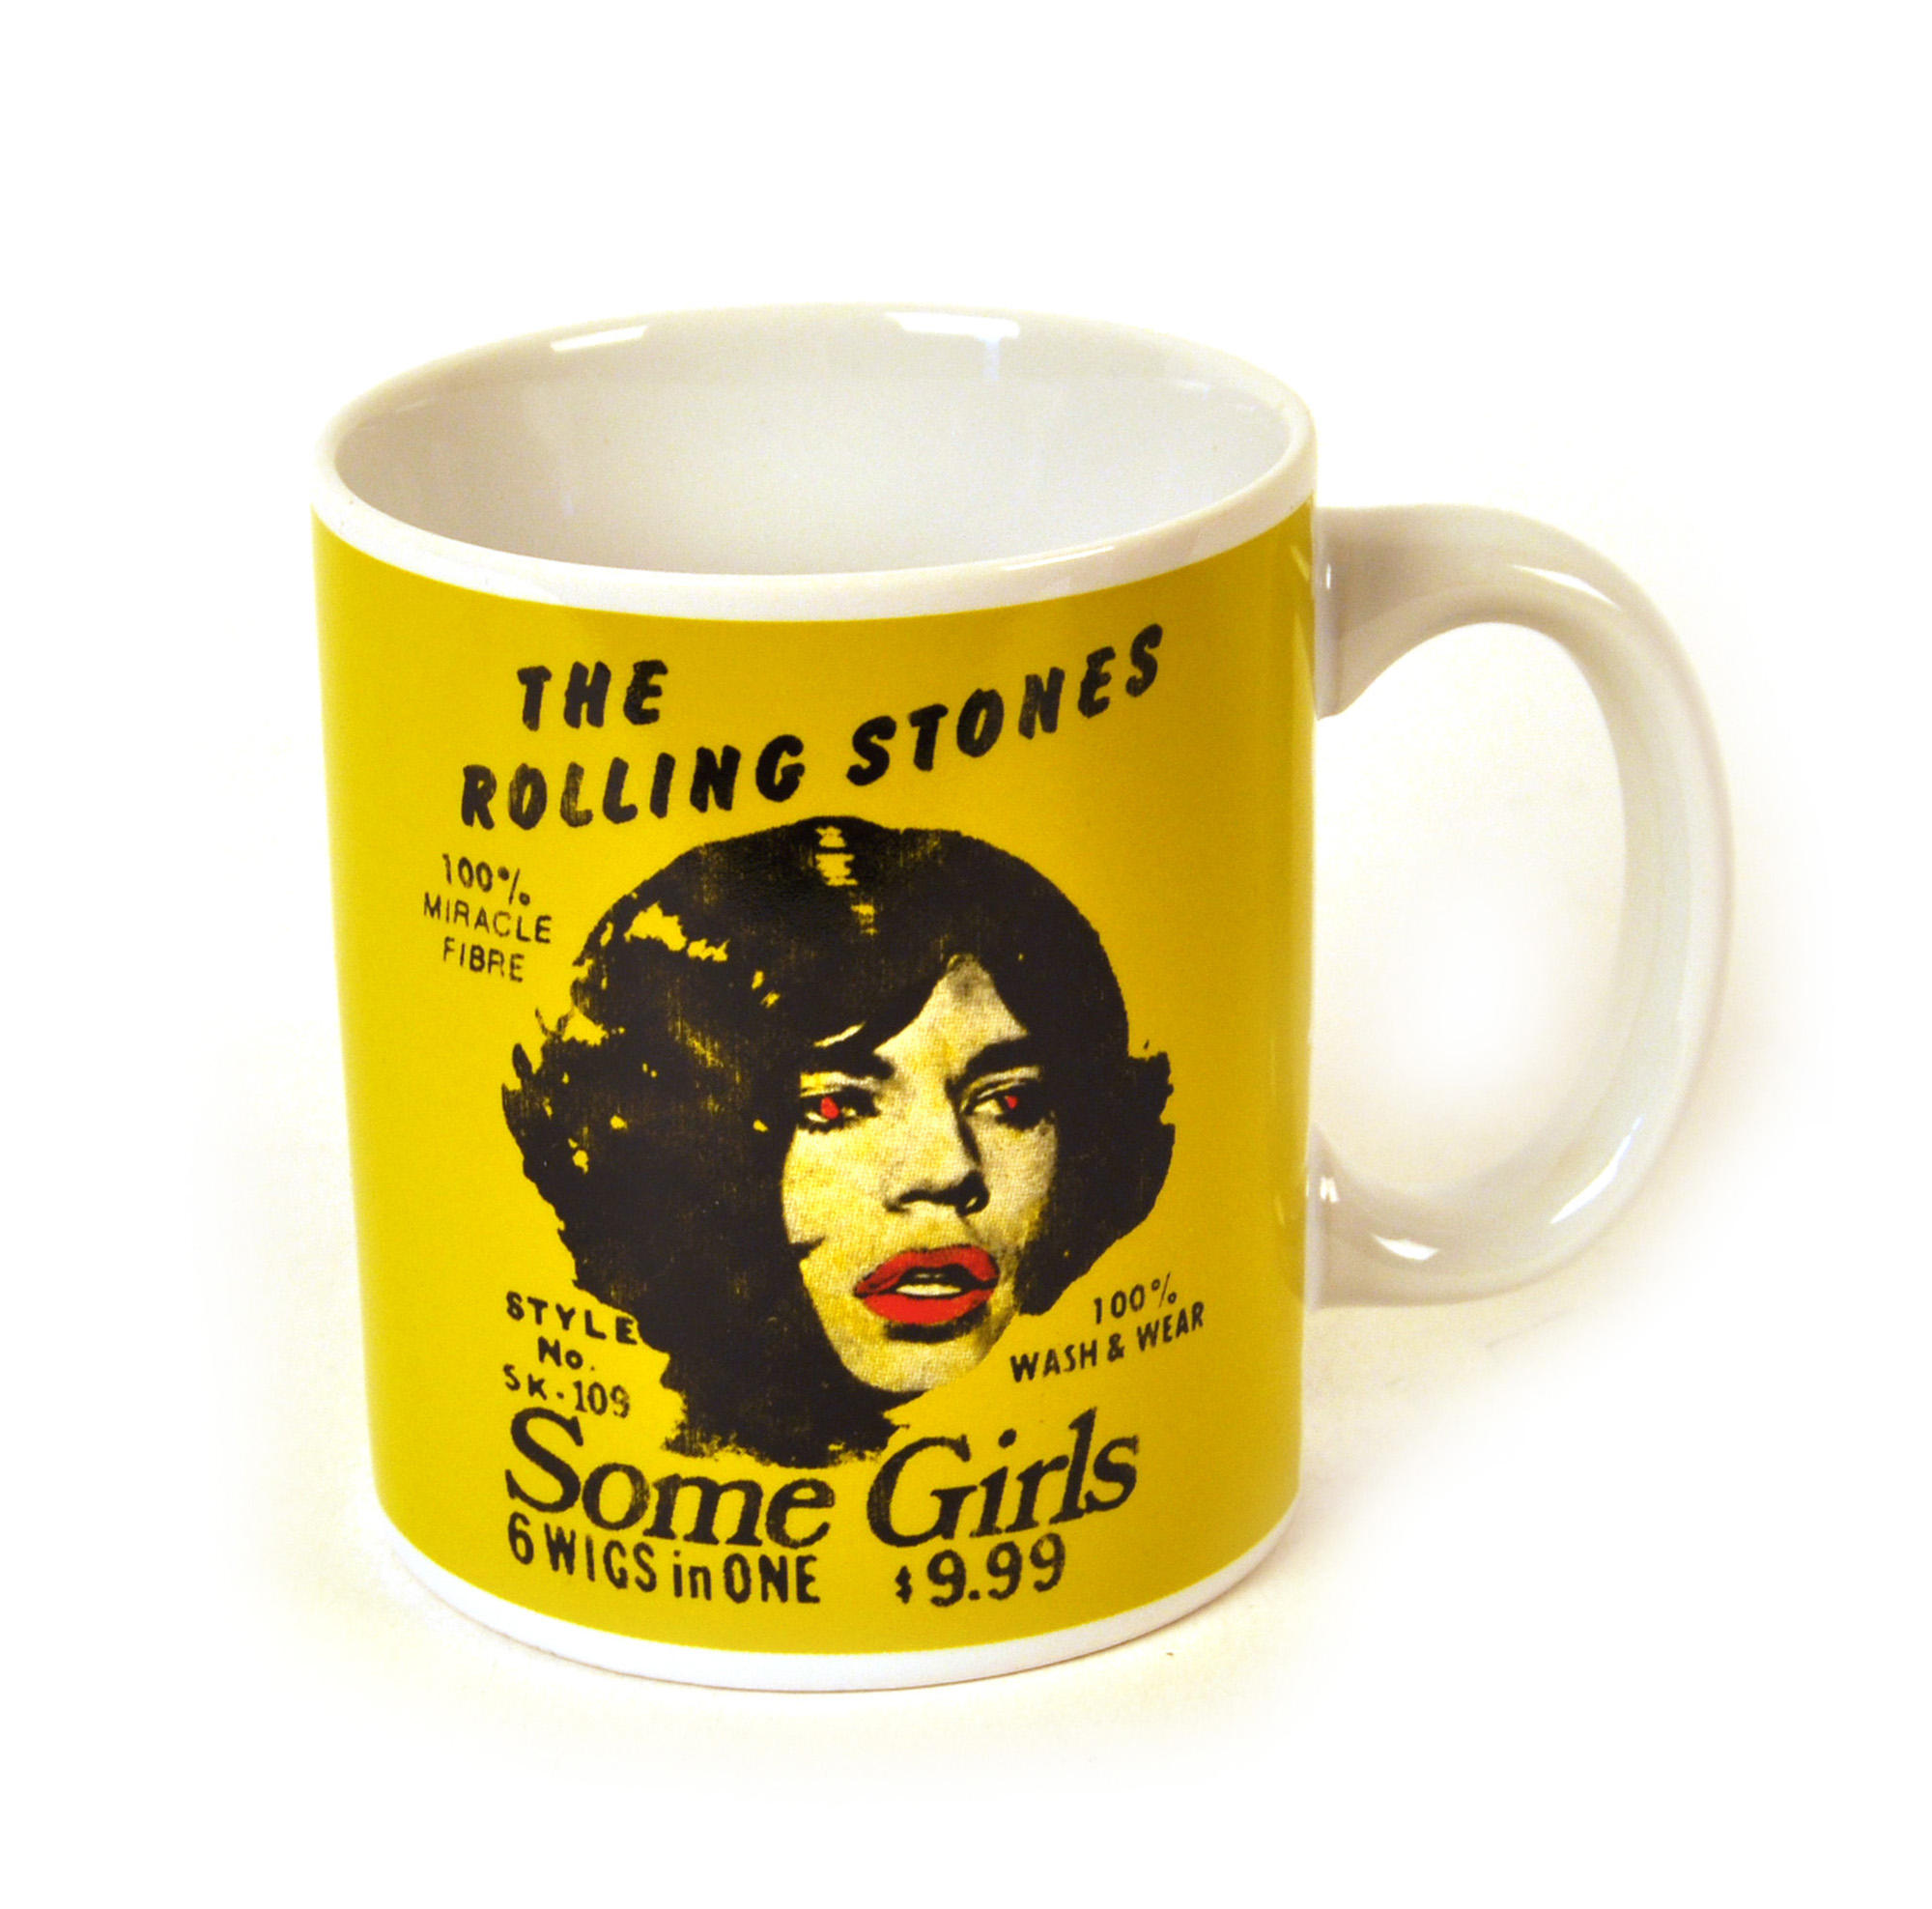 Rolling Stones - Some Girls Boxed Mug